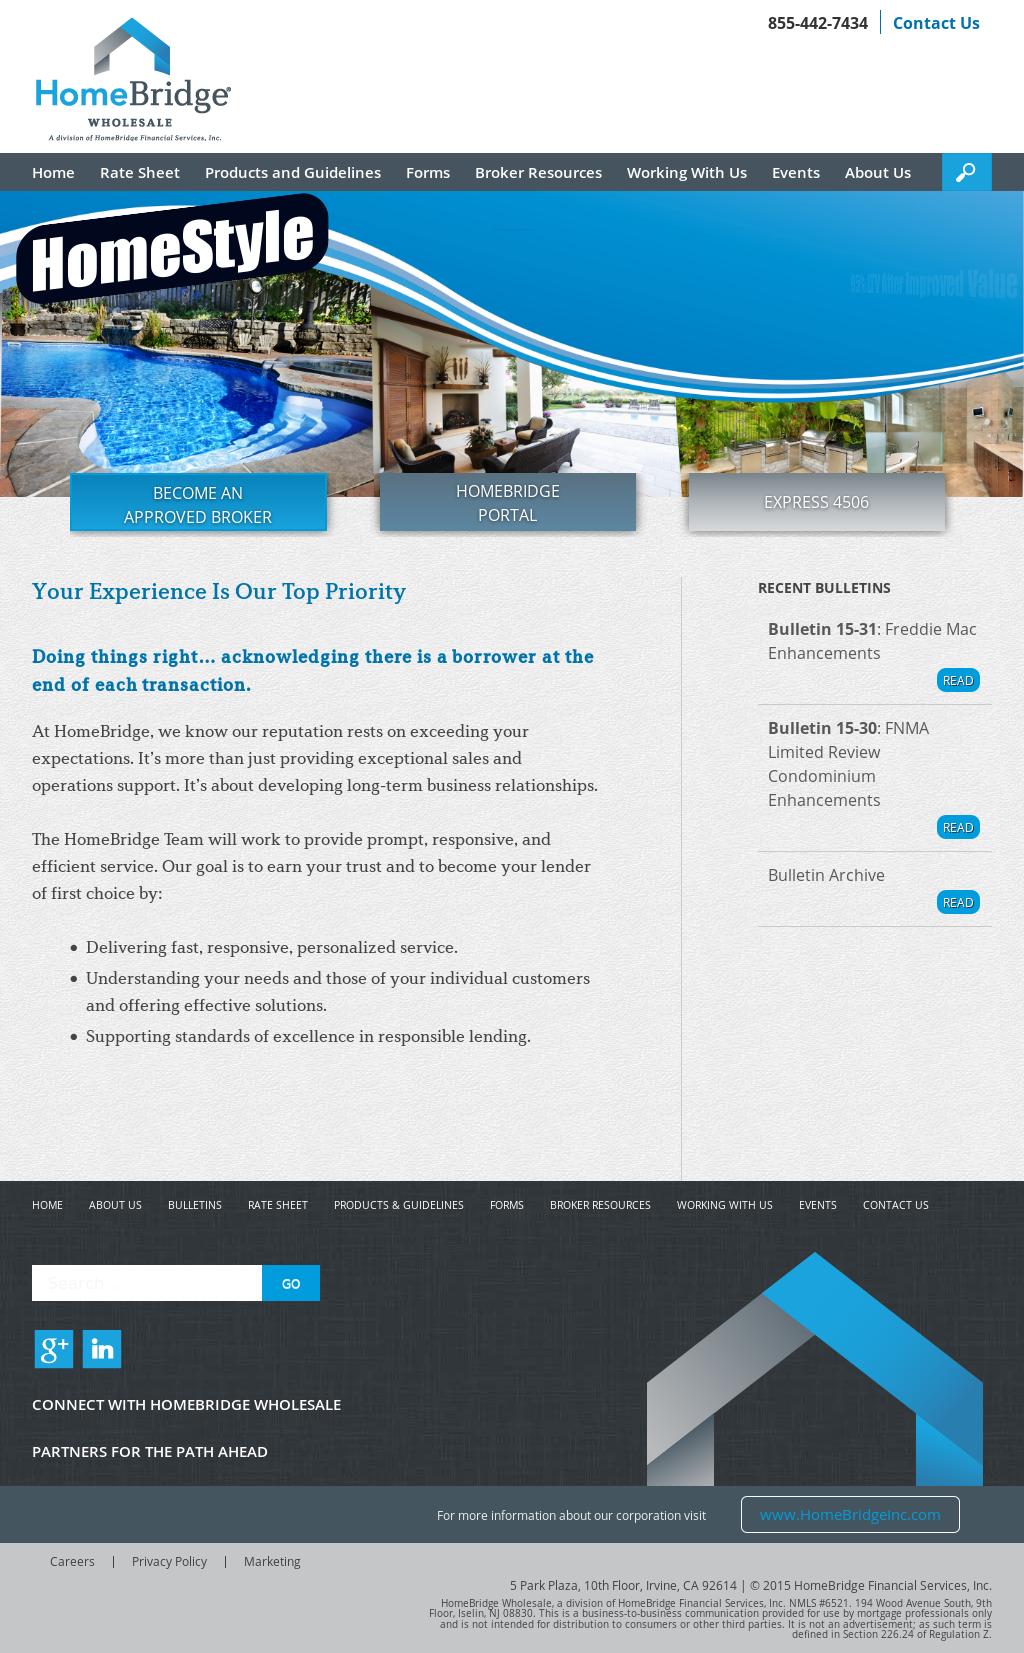 Homebridge Financial Services Competitors, Revenue and